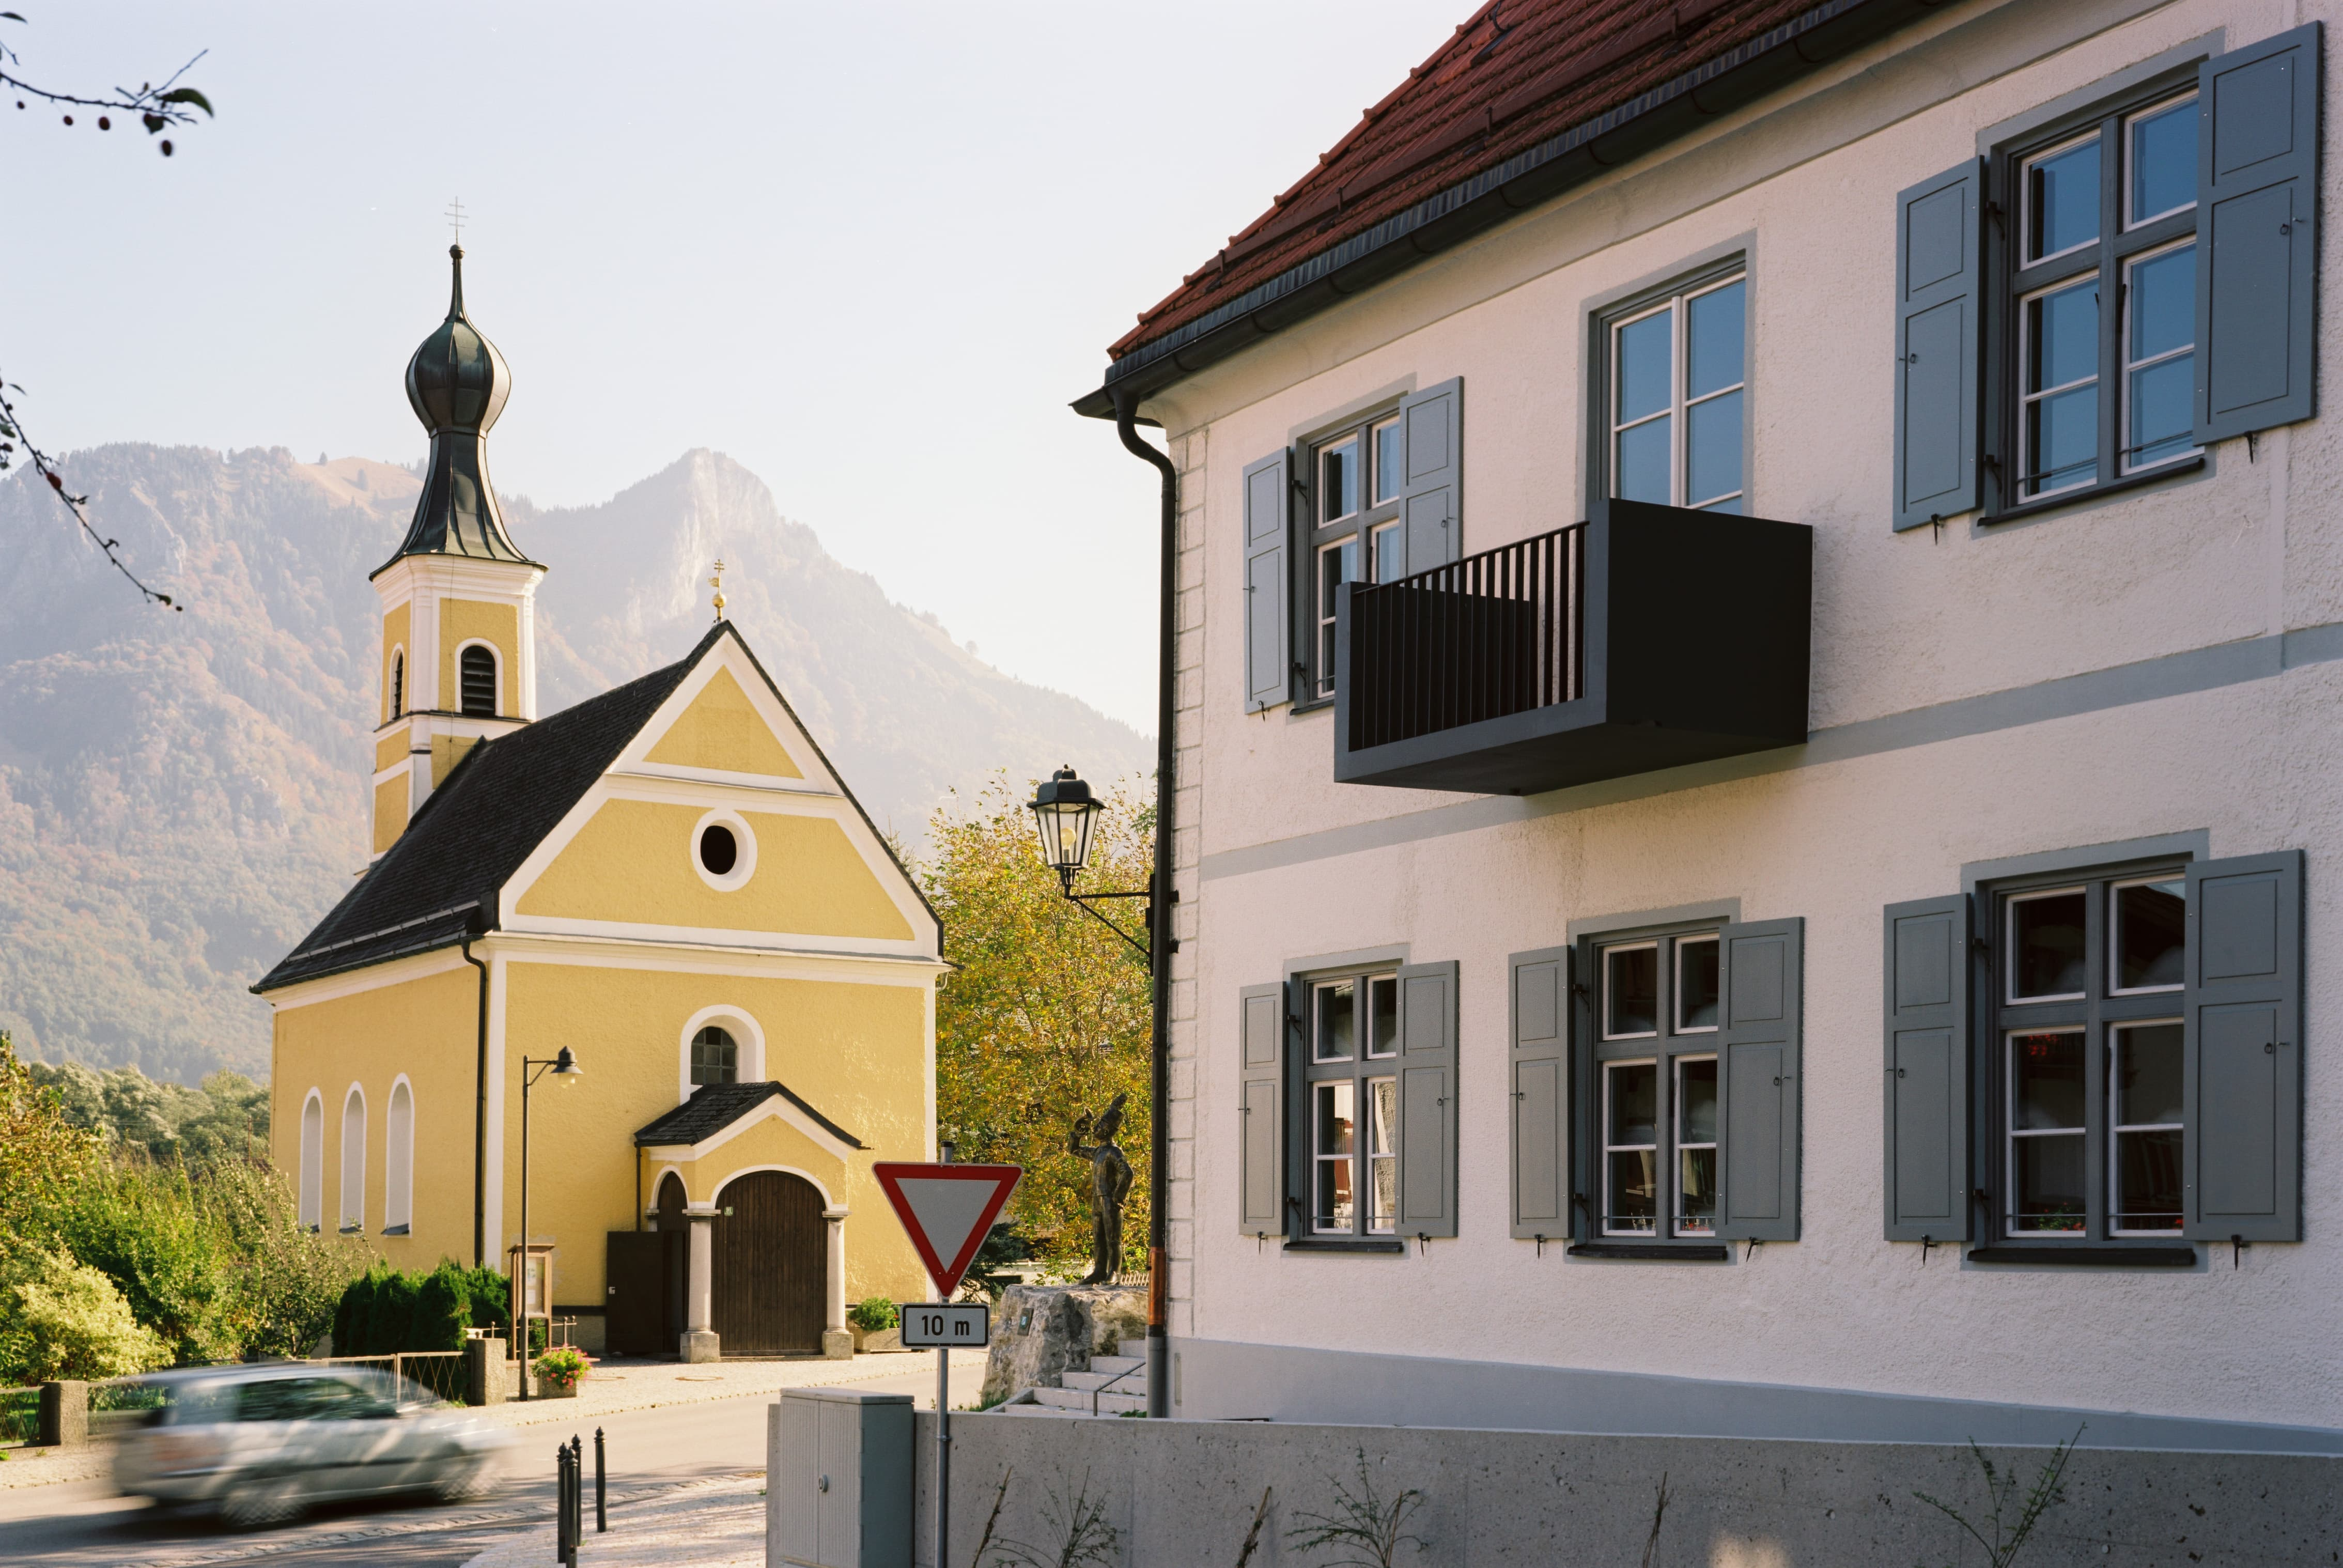 Alte Post Flintsbach Innenhof Kirche